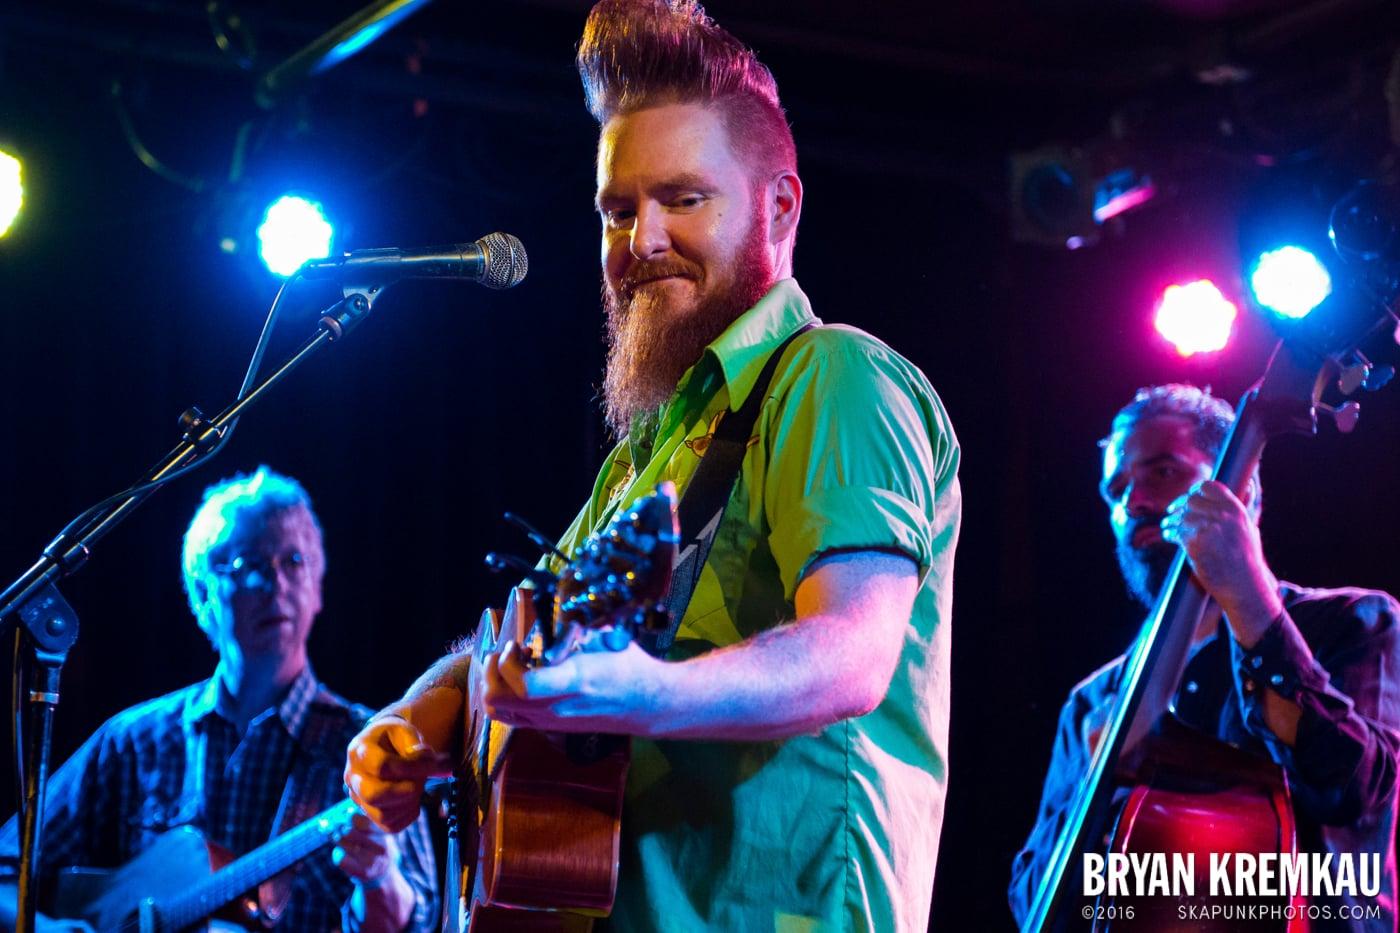 Danny Burns Band @ Knitting Factory, Brooklyn, NY - 9.10.14 (21)